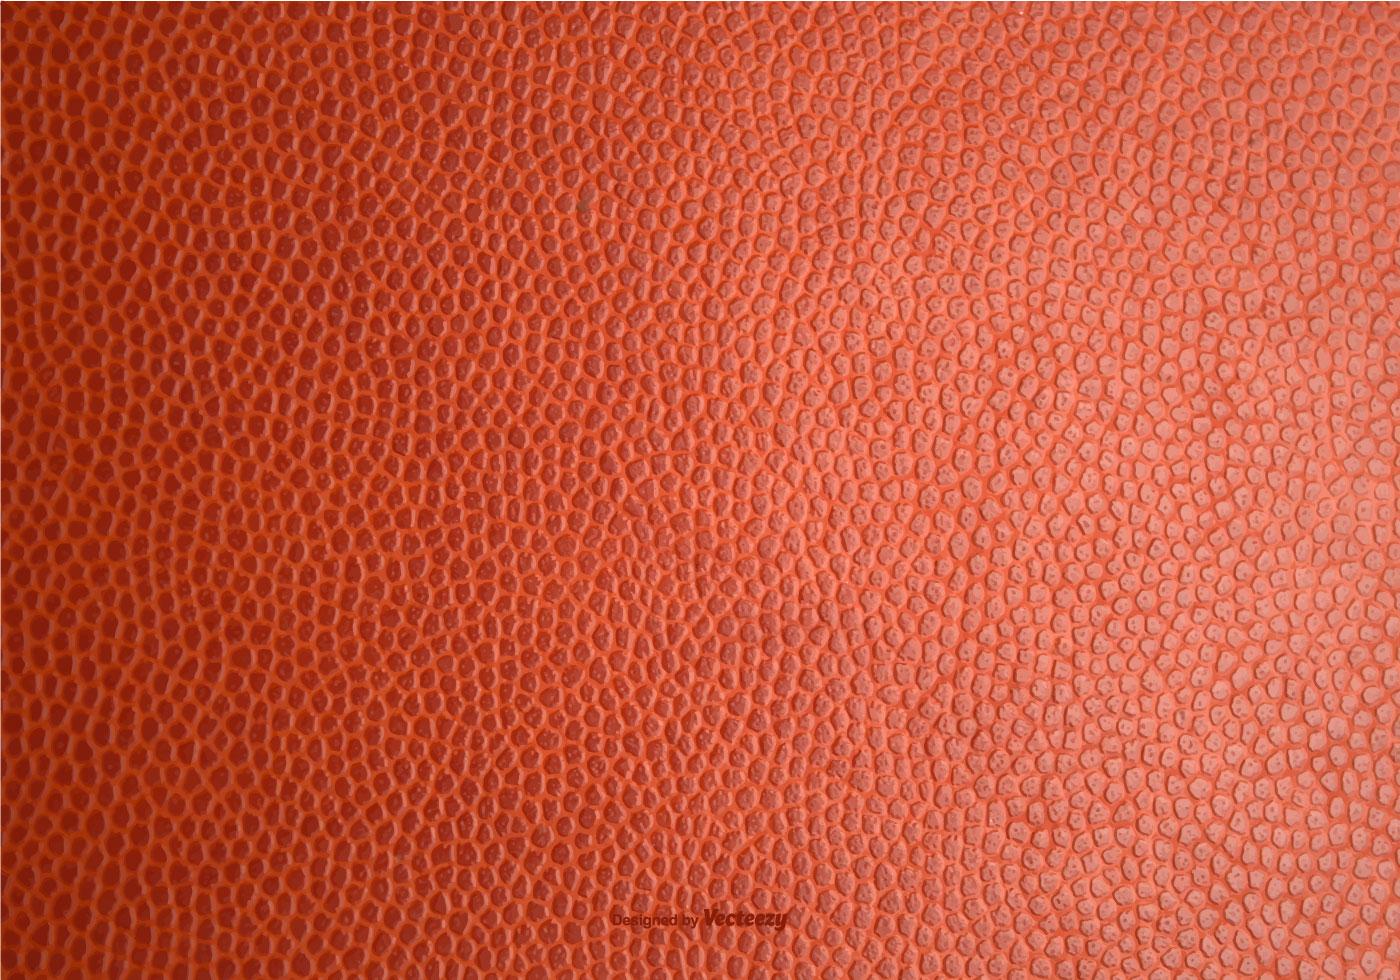 basketball texture free vector art  11241 free downloads basketball hoop clip art torn photoshop basketball hoop clipart black and white